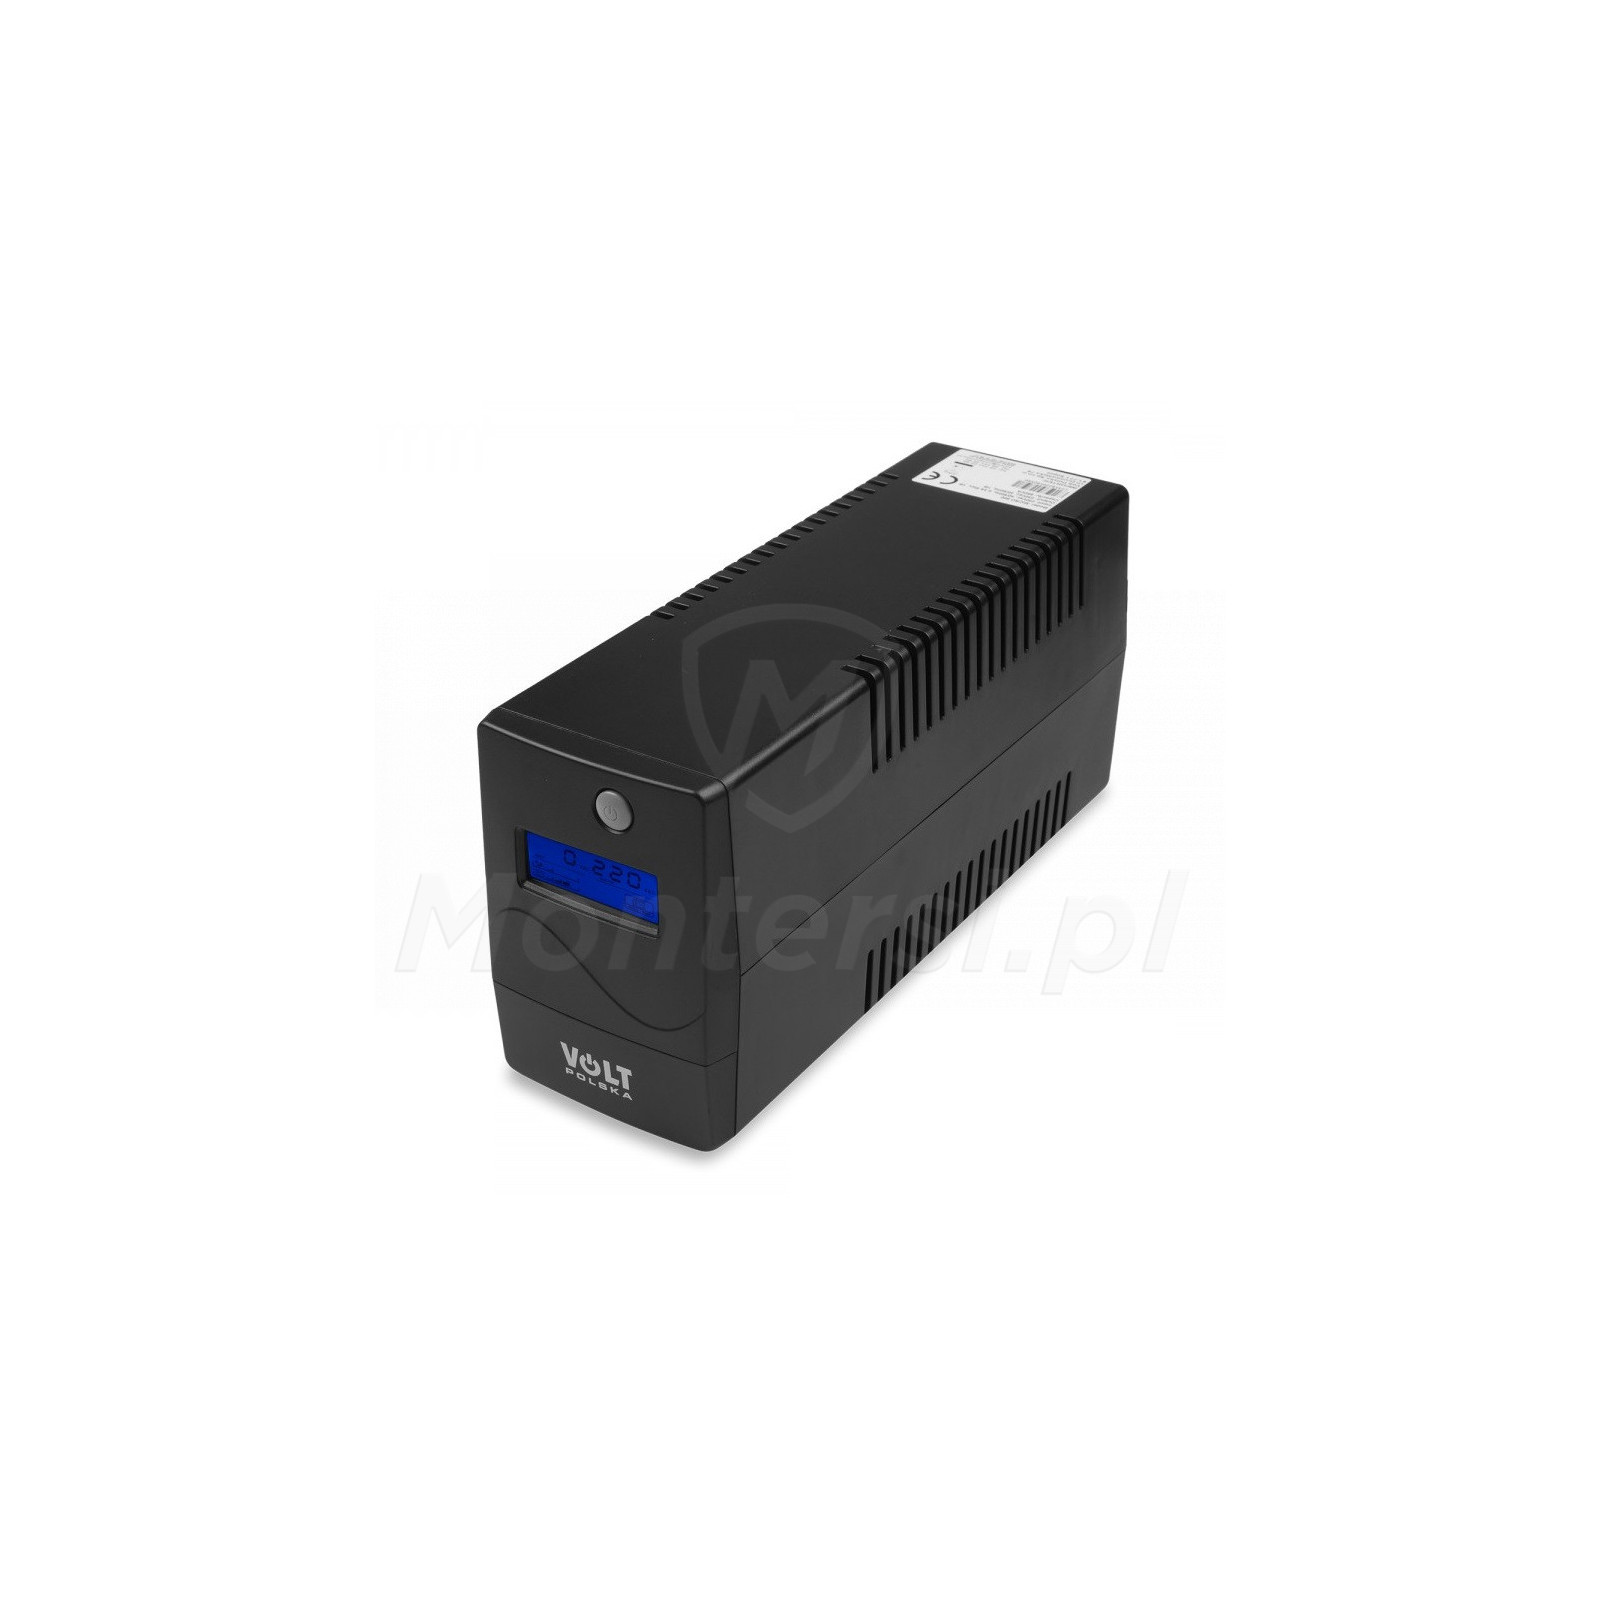 Zasilacz Micro UPS 600 7Ah